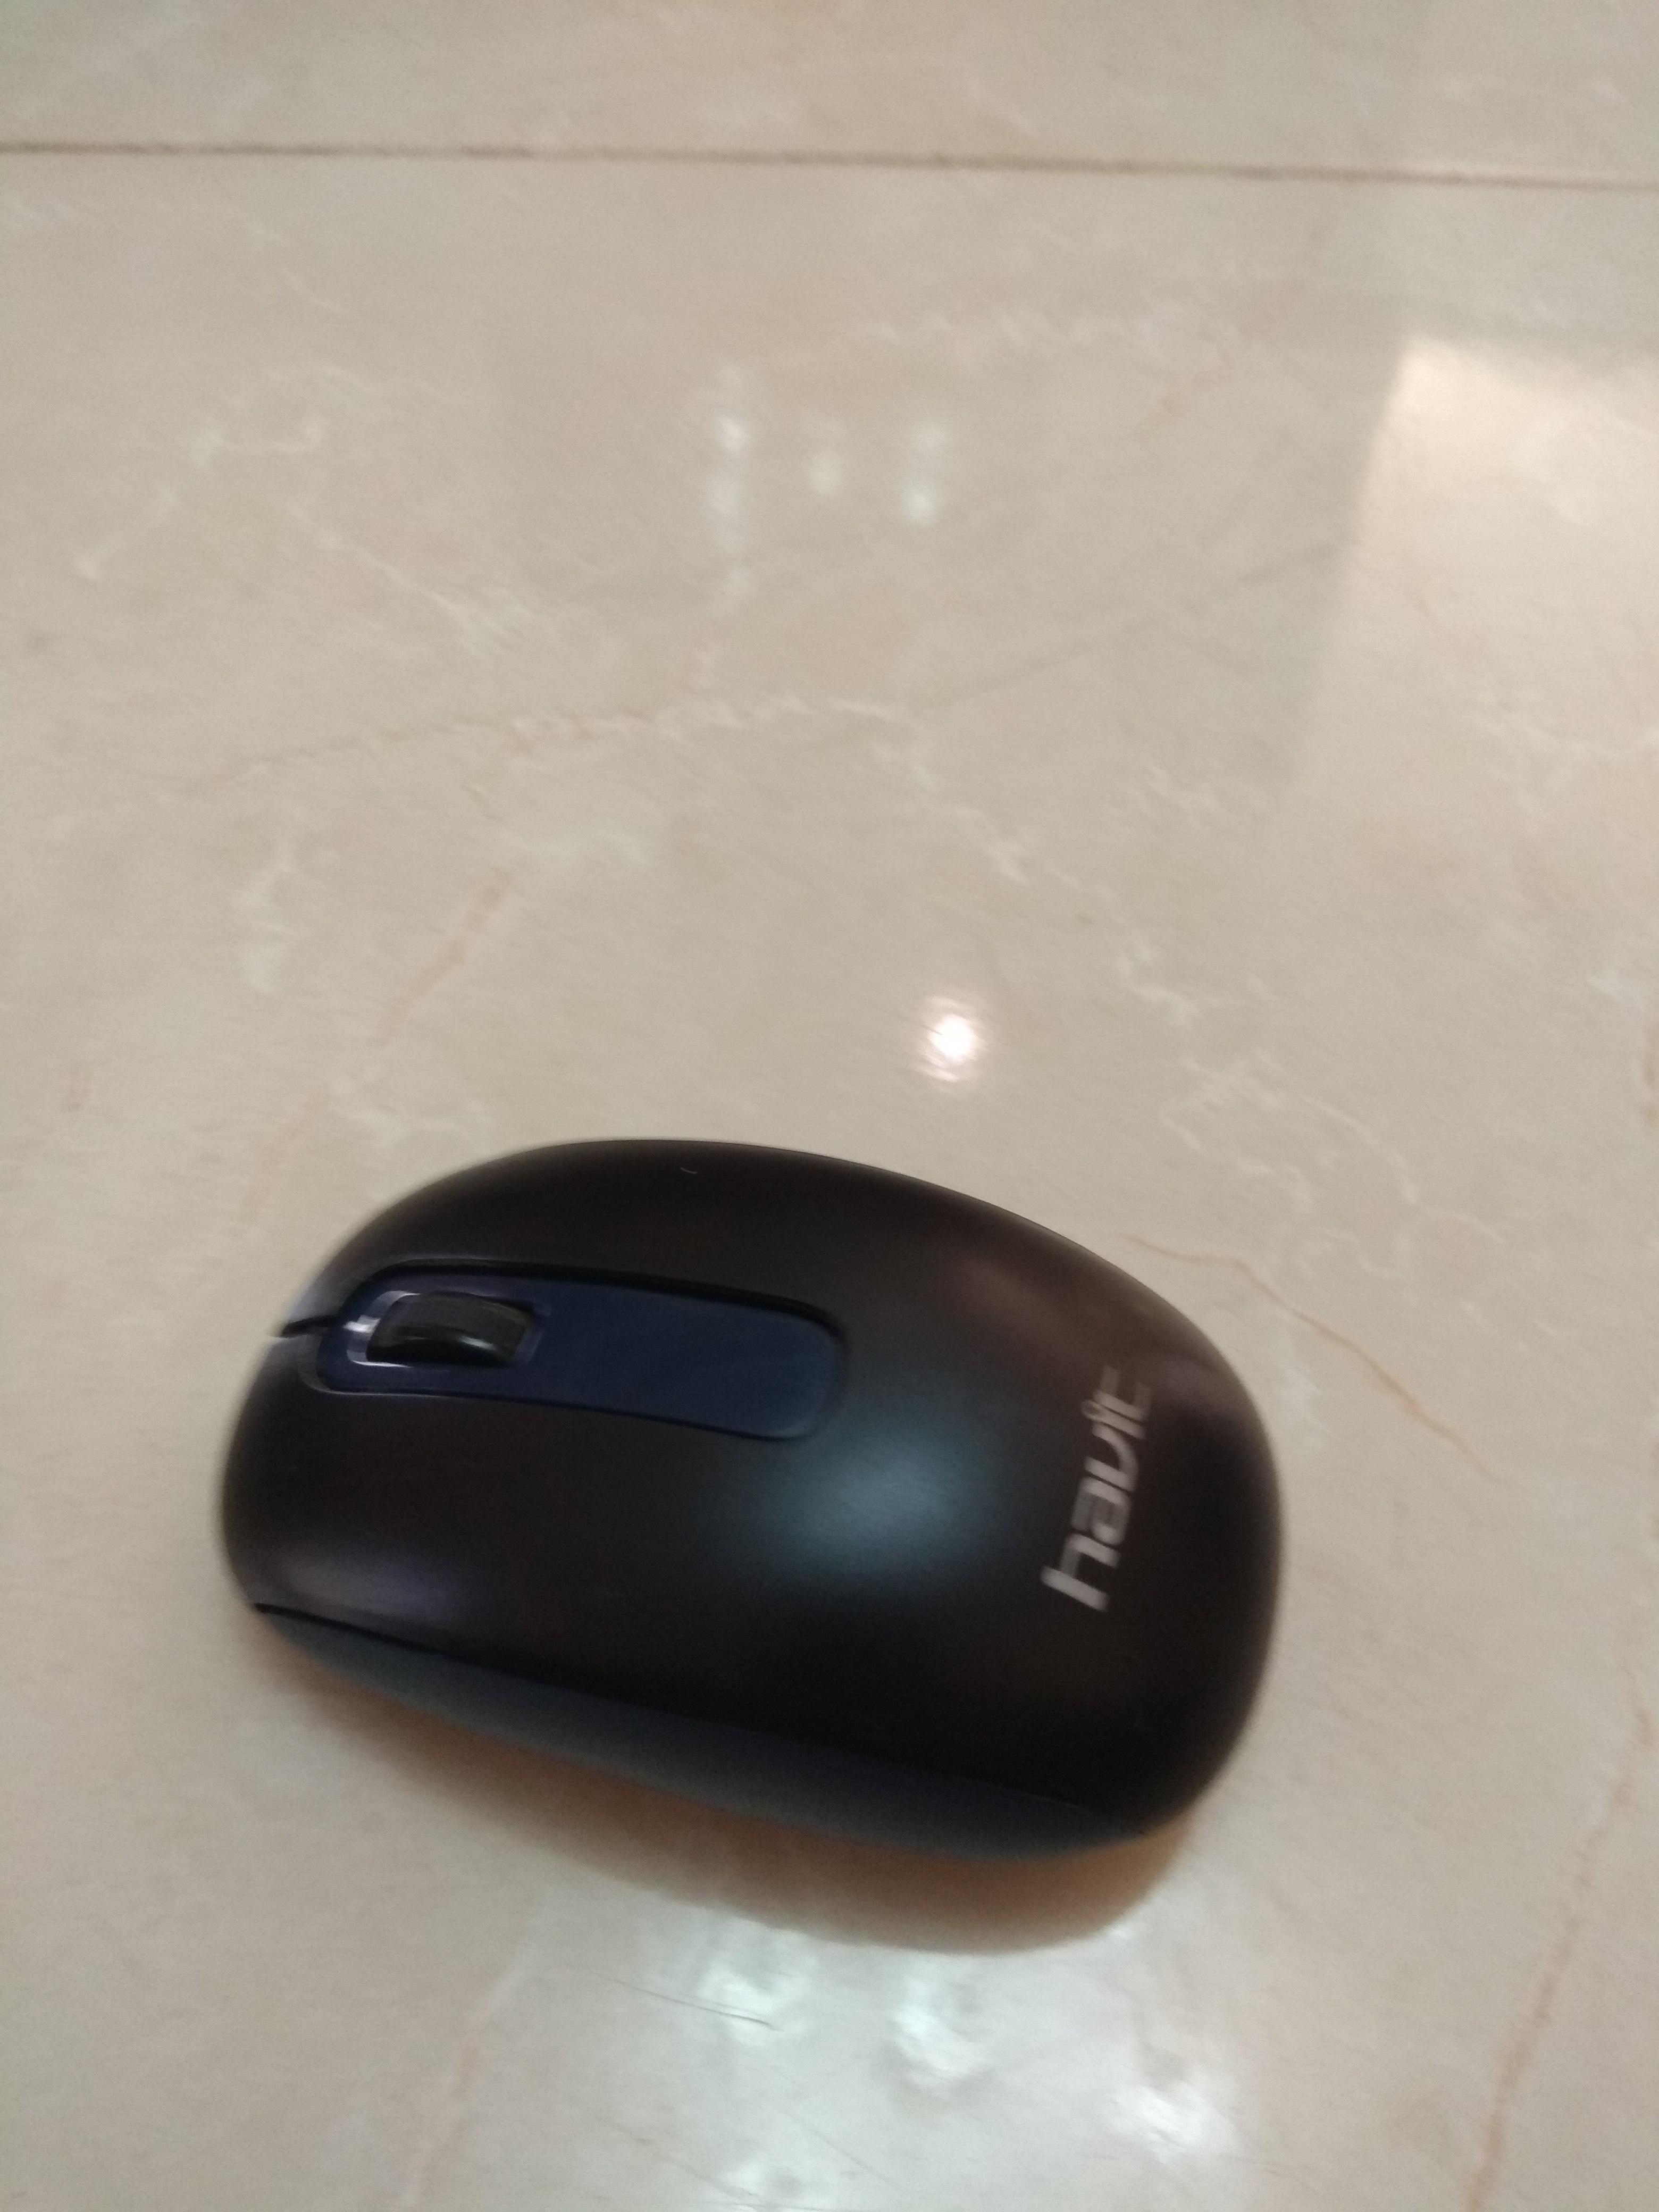 Mickey: Lost wireless usb receiver [IMG]